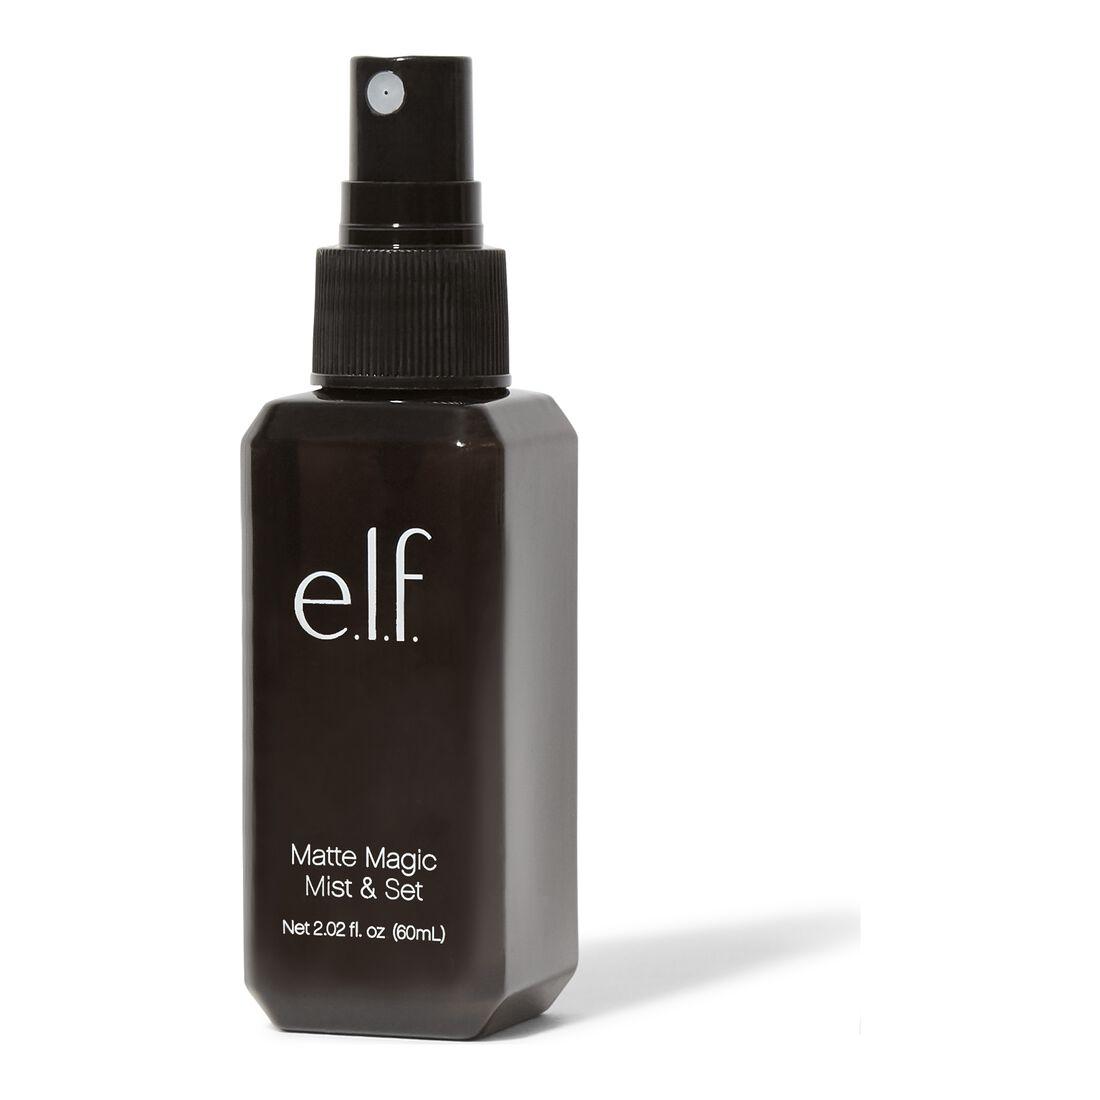 E.l.f Cosmetics - Matte Magic Mist & Set - Small